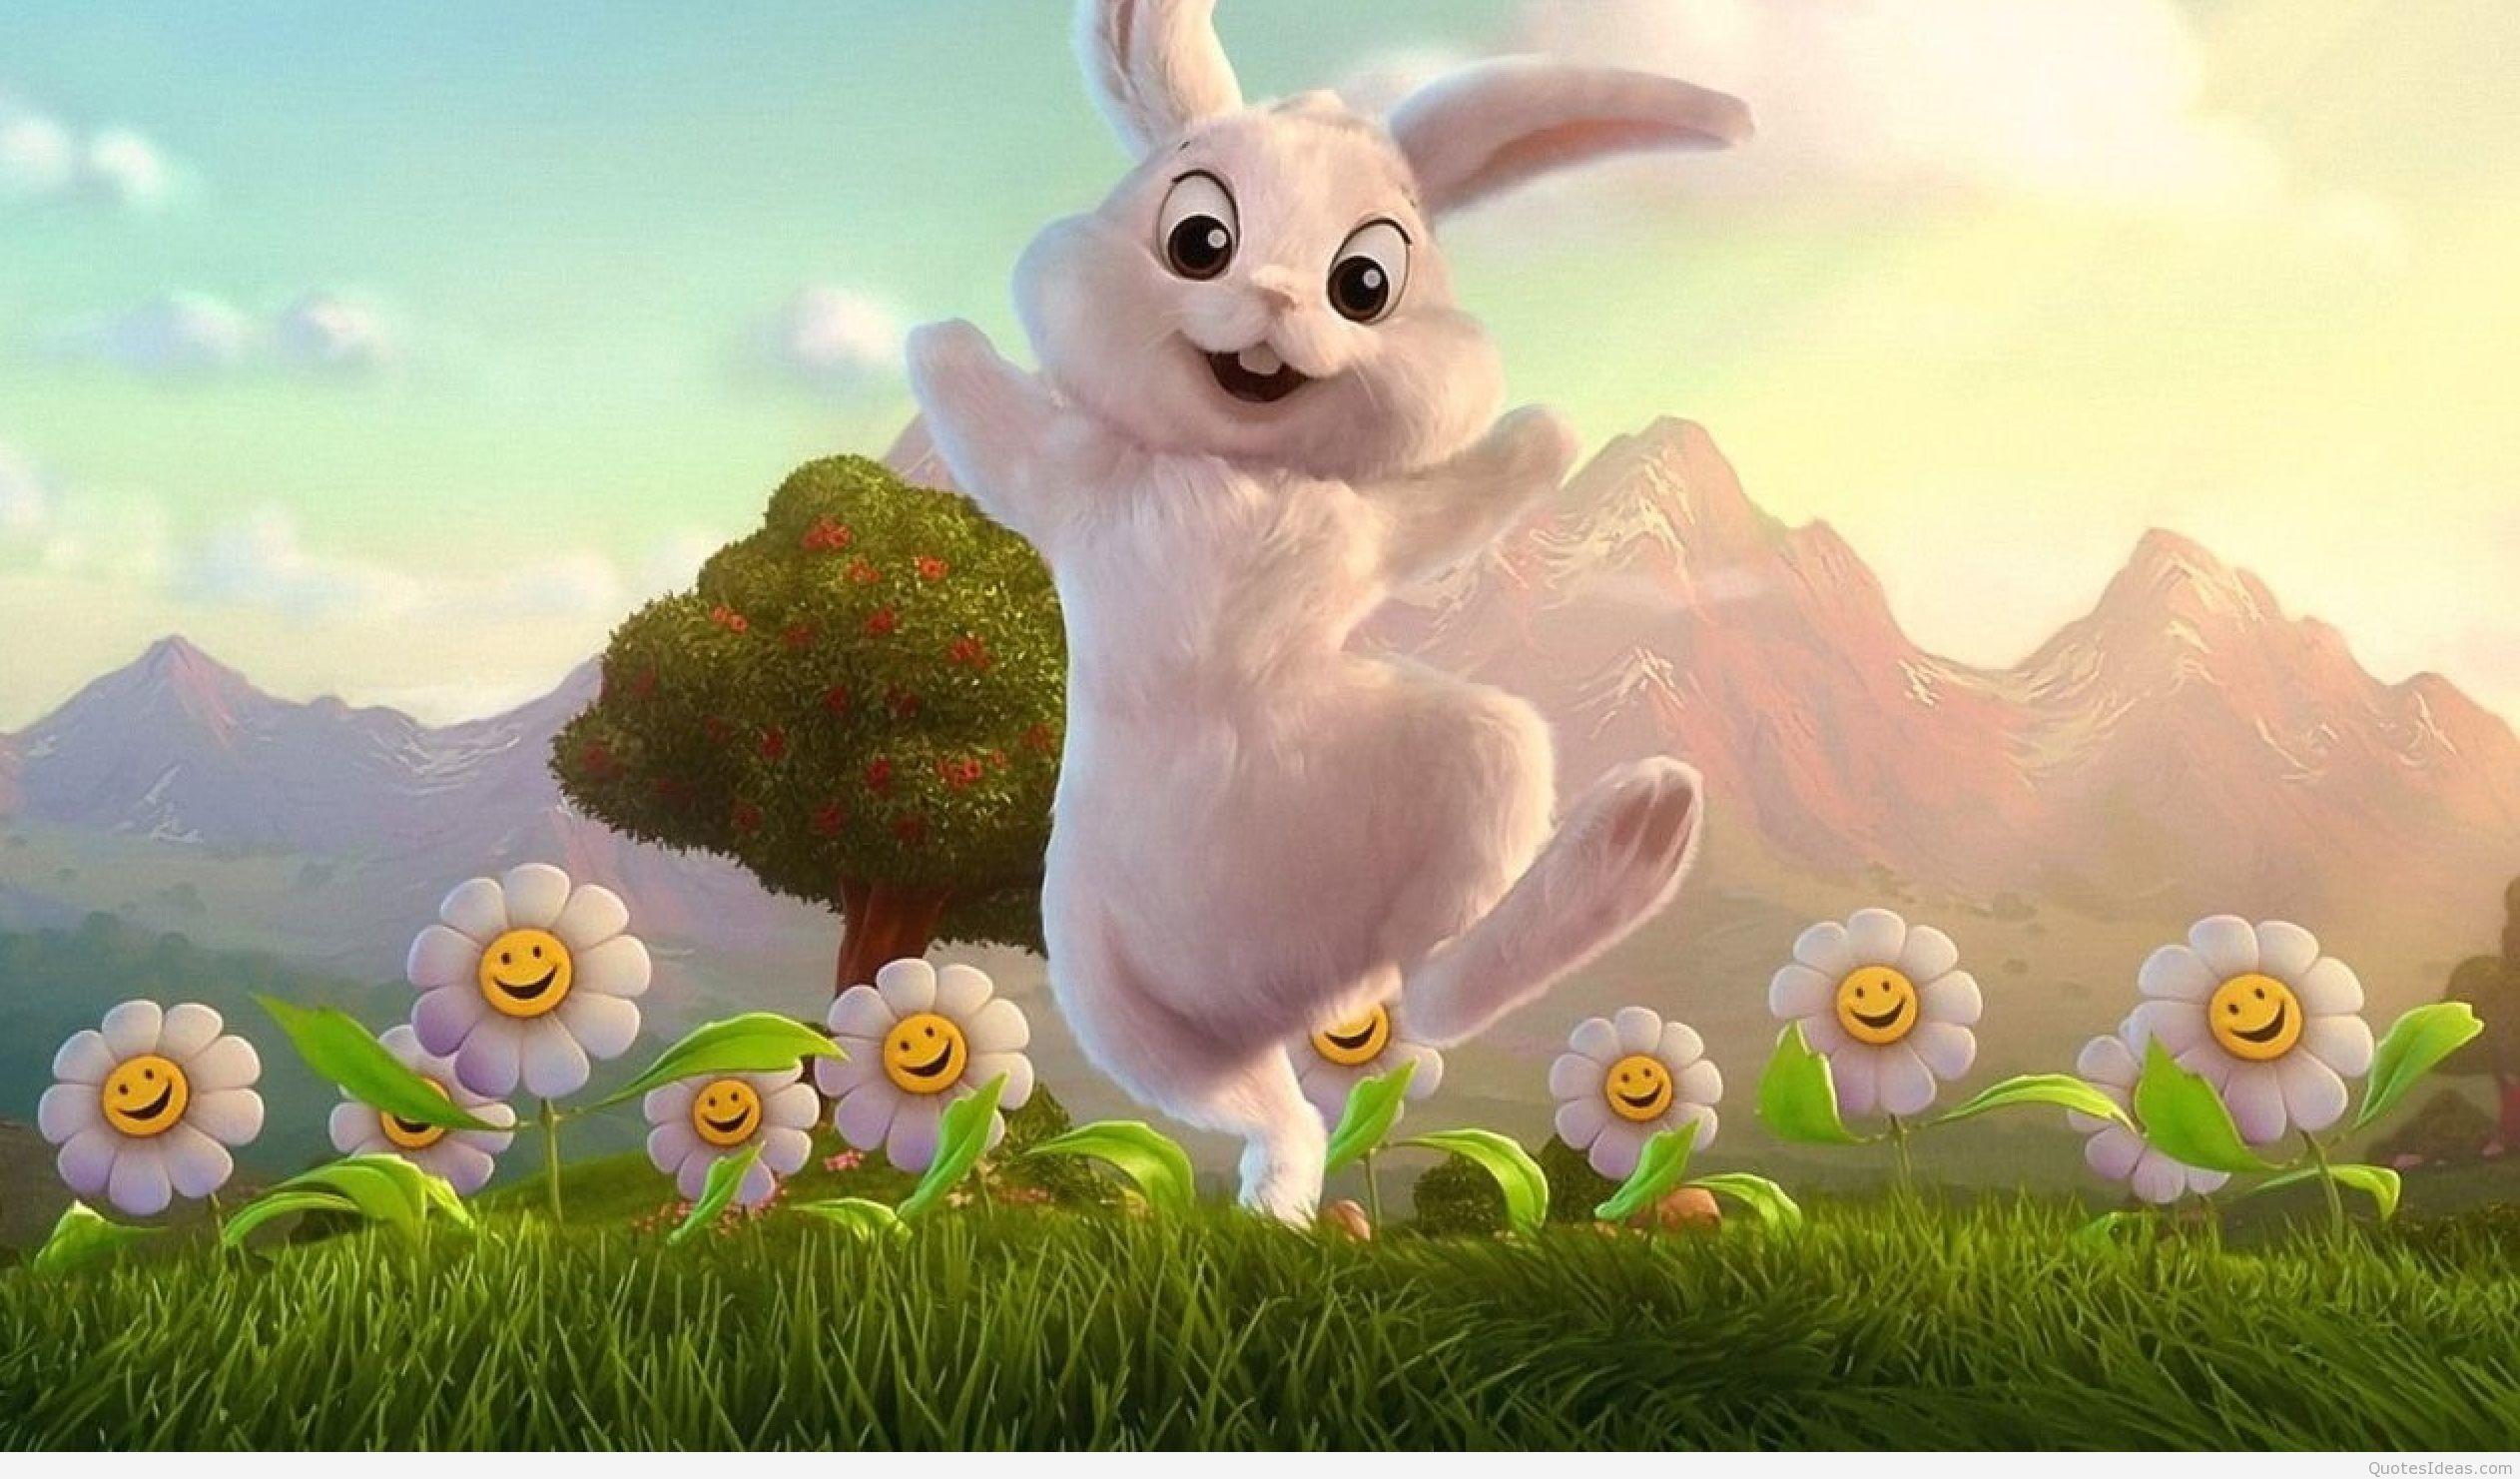 … happy-easter-bunny-wallpaper-2560×1600 …